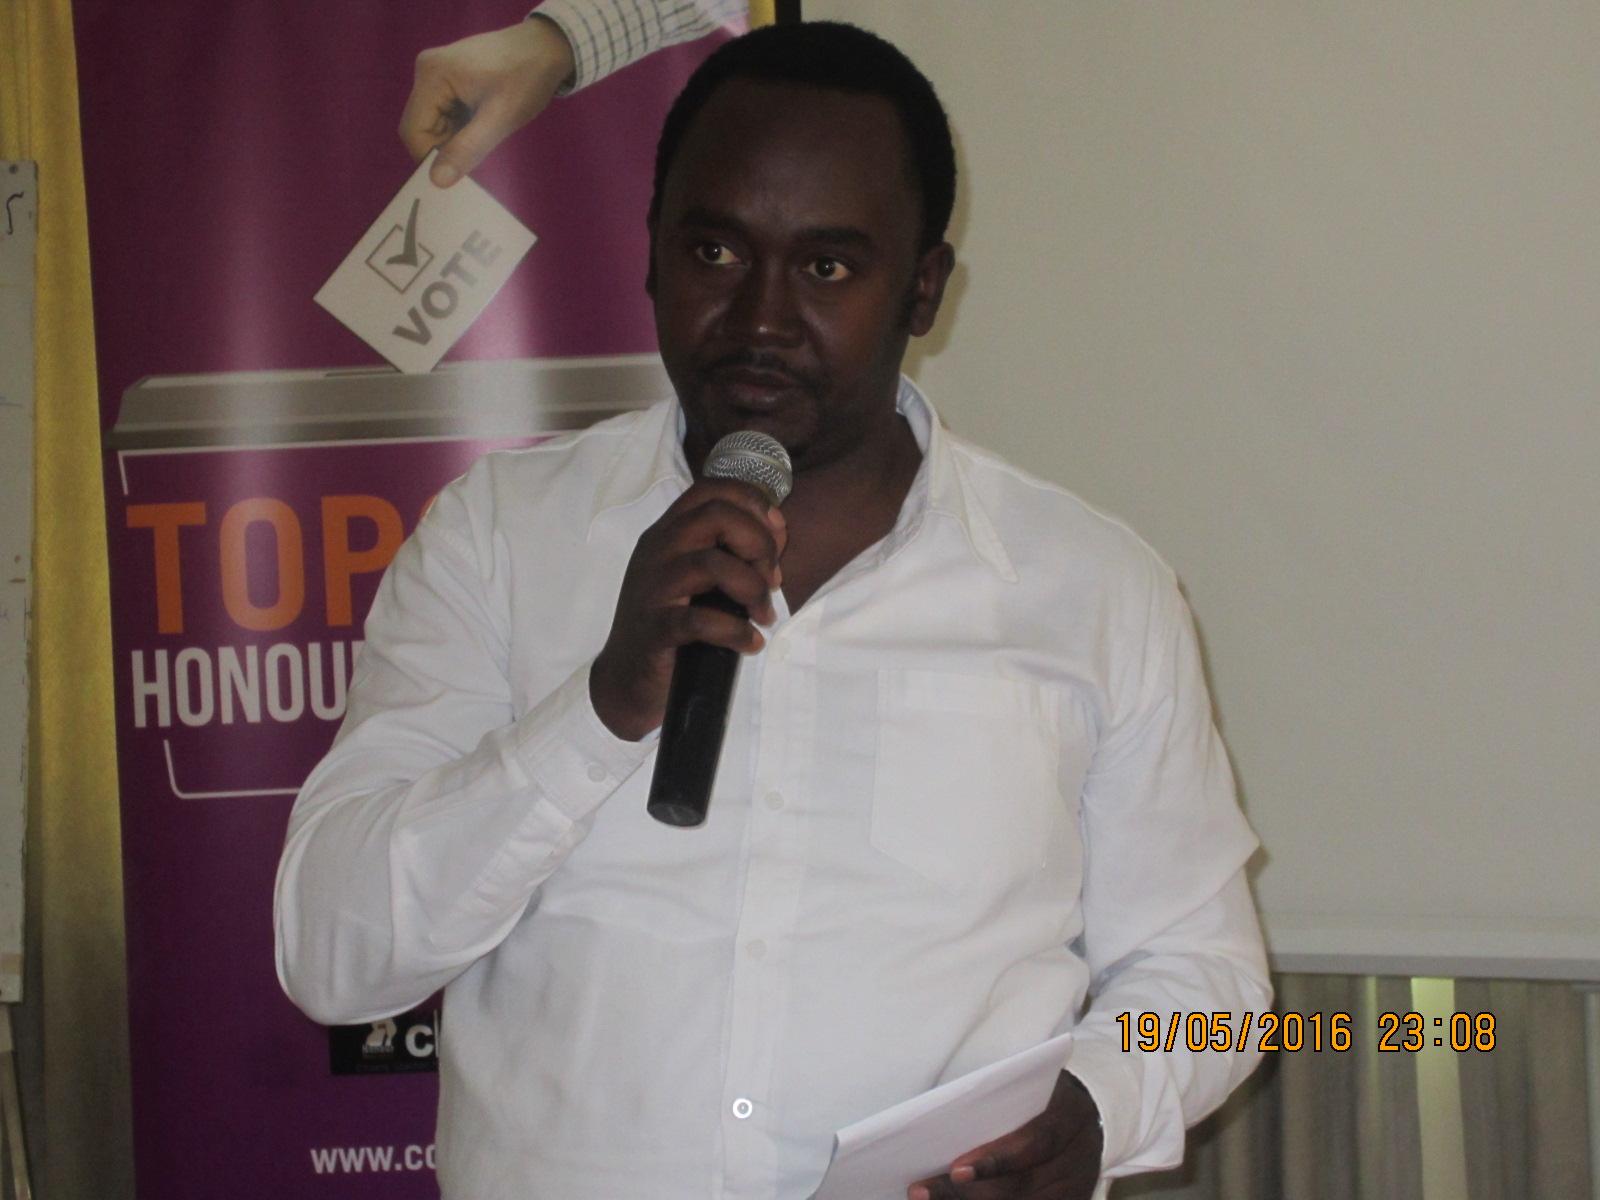 Mr. Chrispy Kaheru-coordinator CCEDU.